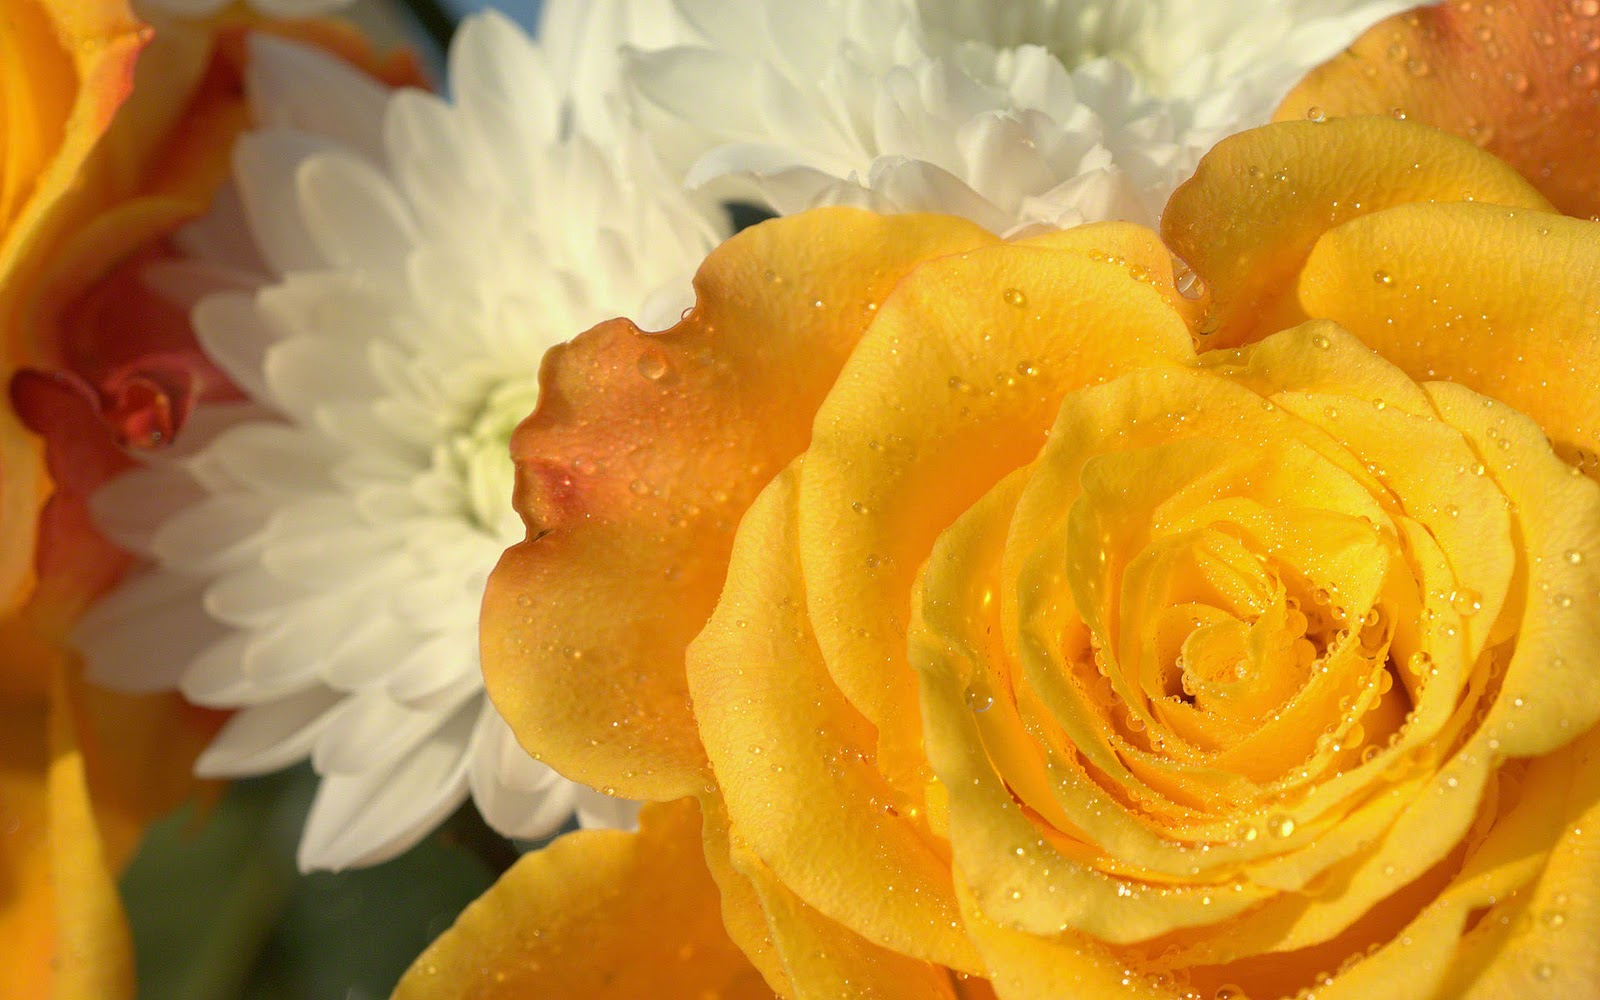 http://2.bp.blogspot.com/-9JbgH2IZbSU/TsvMraCPjLI/AAAAAAAAAeU/hjouqdkCGVc/s1600/yellow-rose-wallpaper-dsc06871.jpg